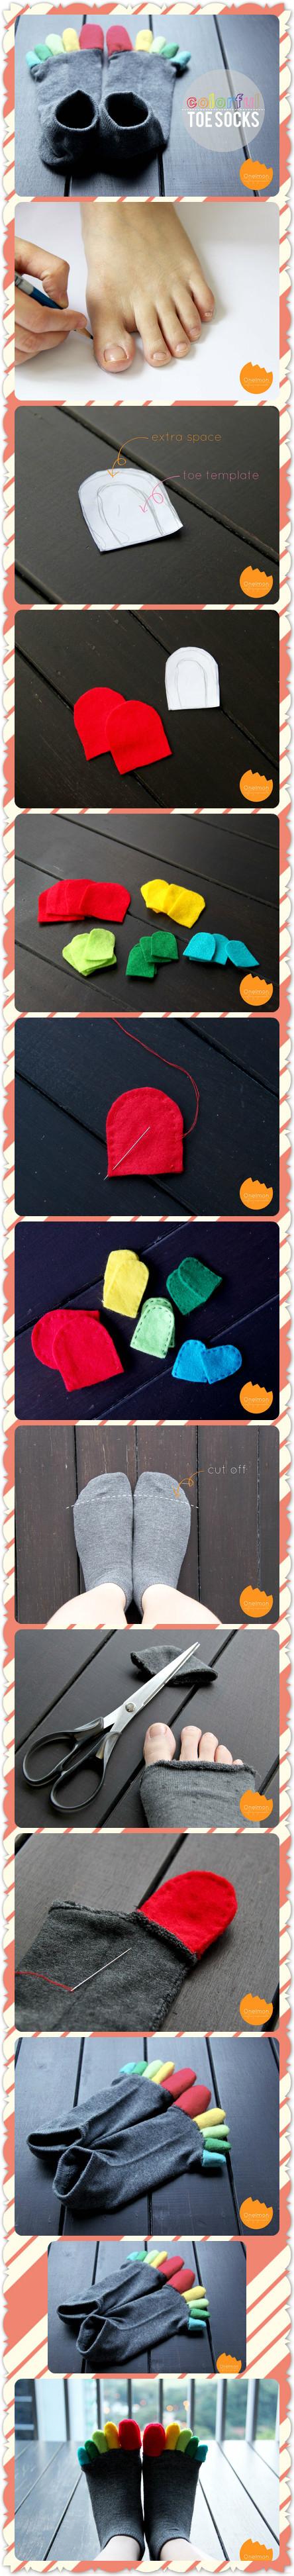 DIY Colorful Toe Socks